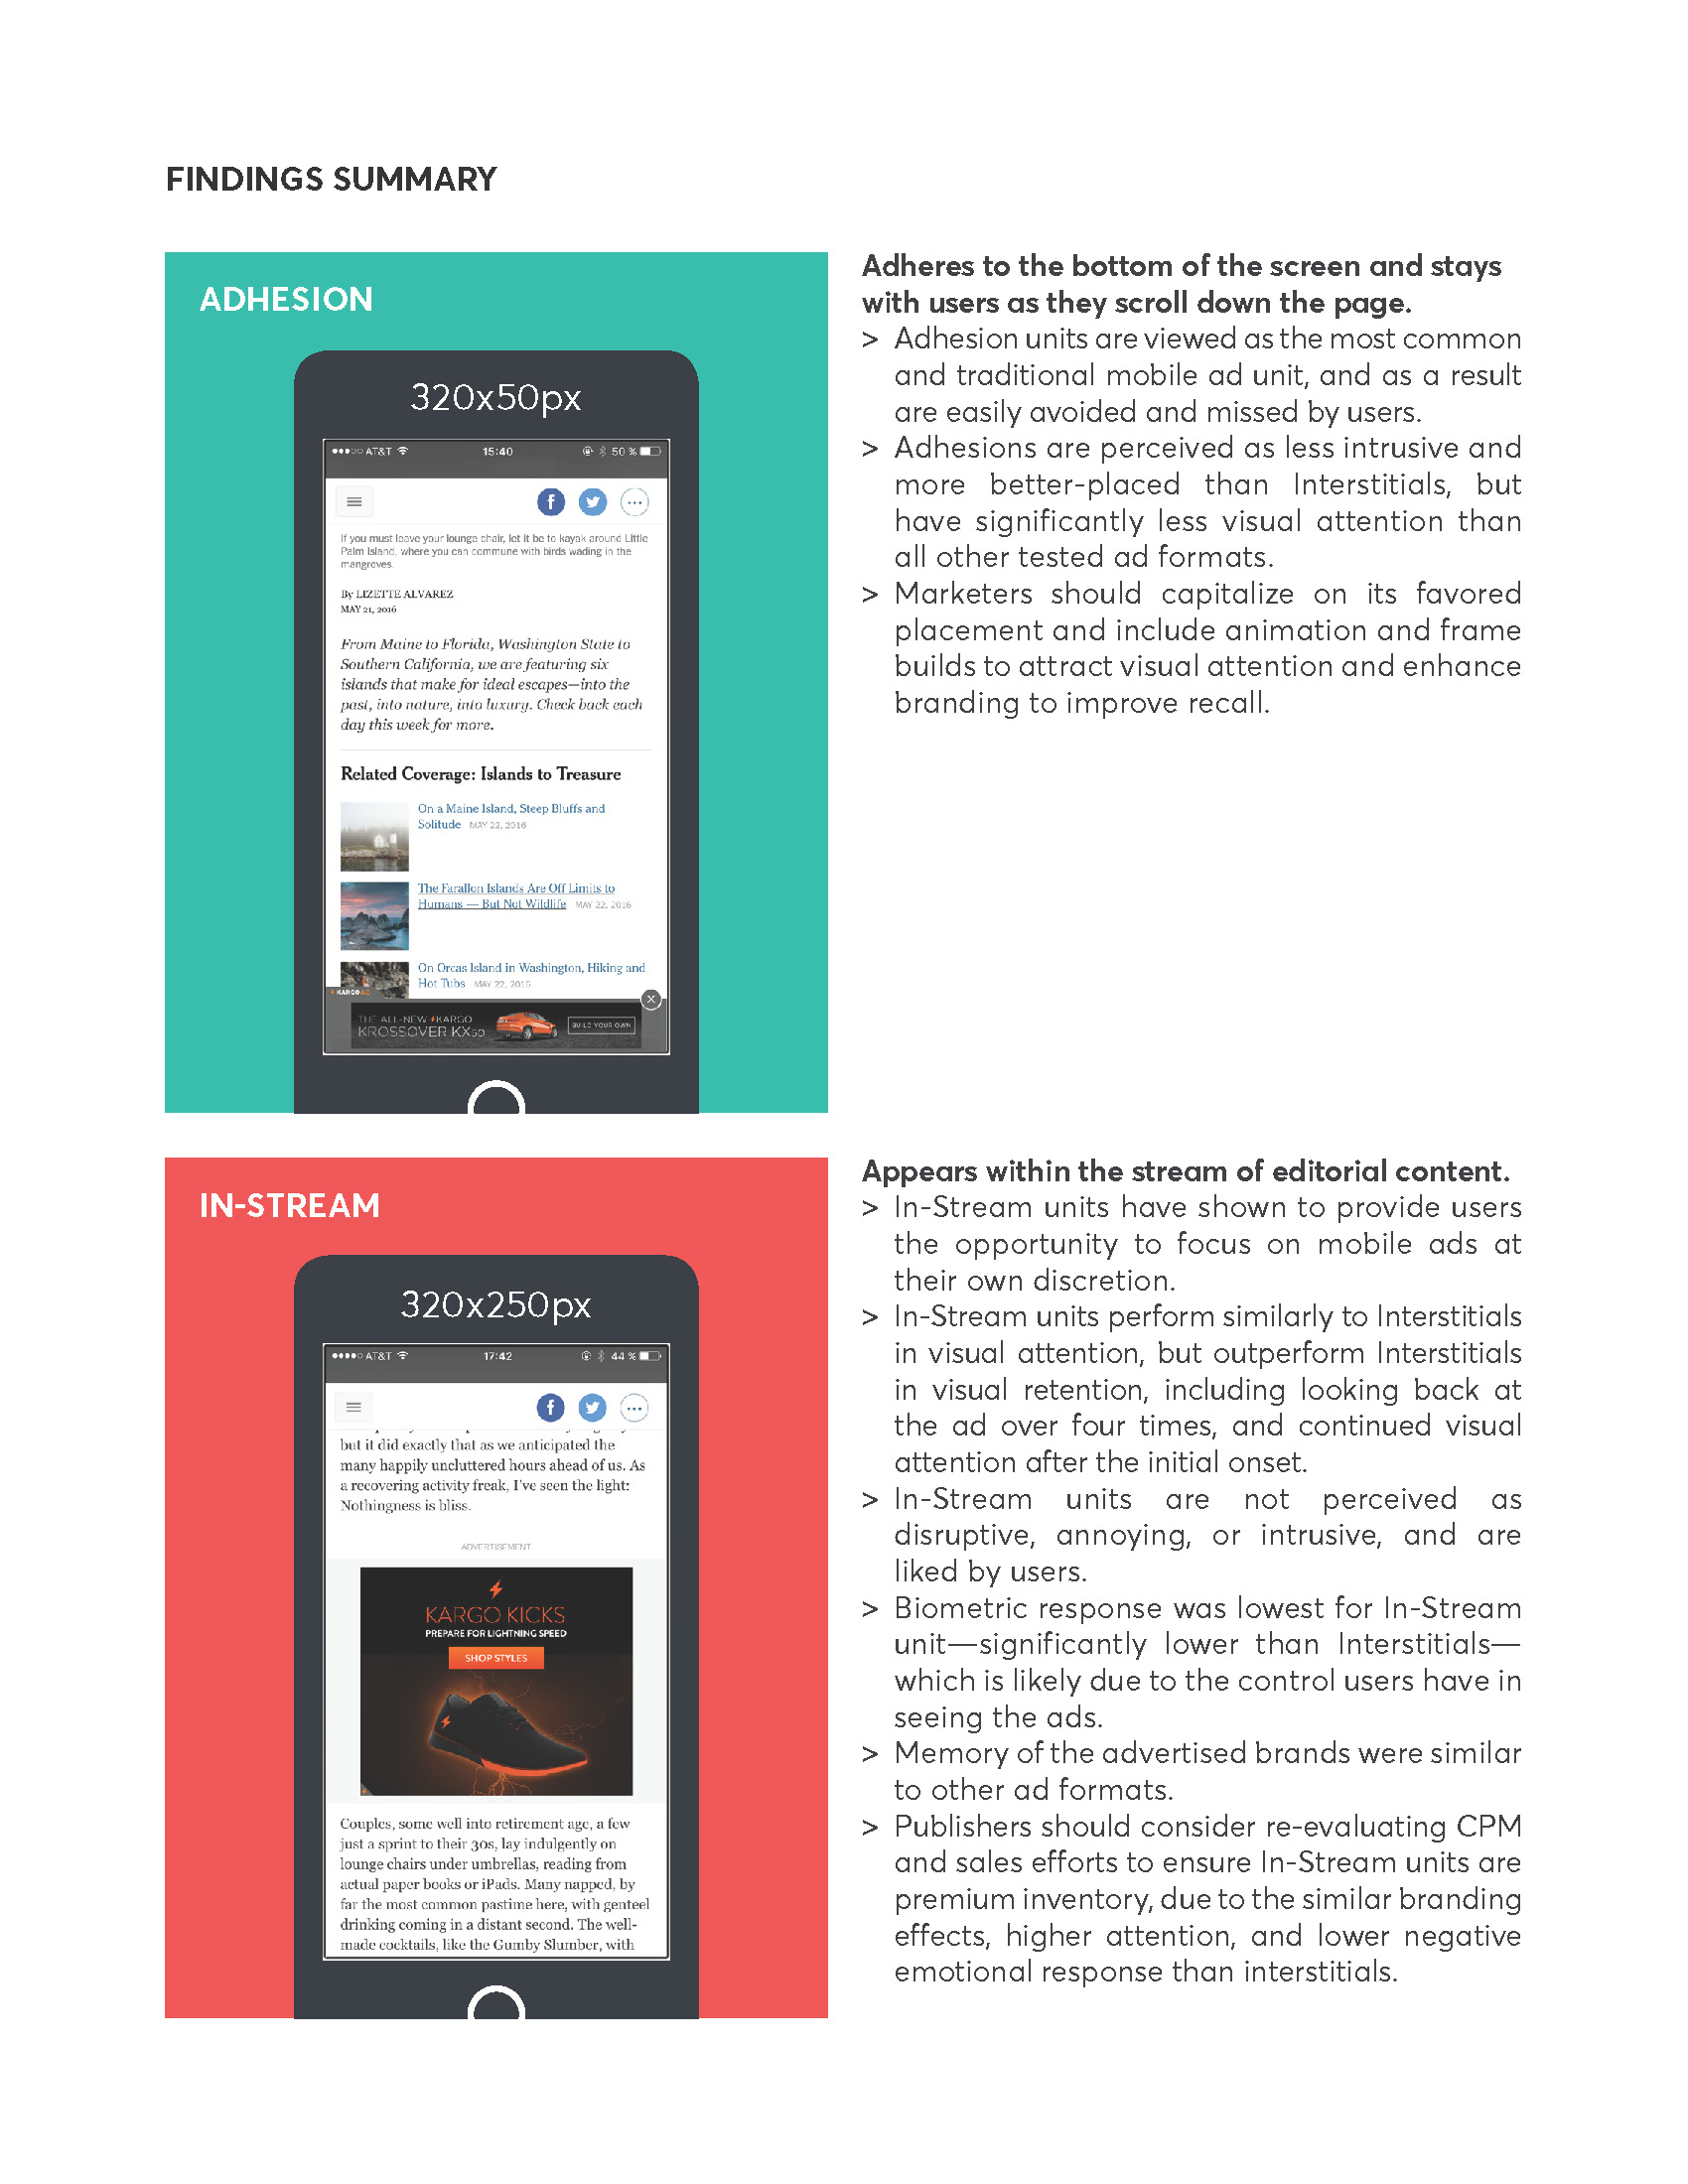 Captivate vs Aggravate Study_Page_05.jpg